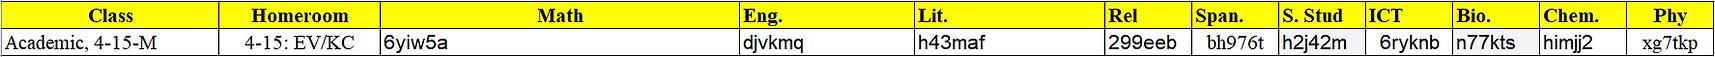 415M Info.PNG